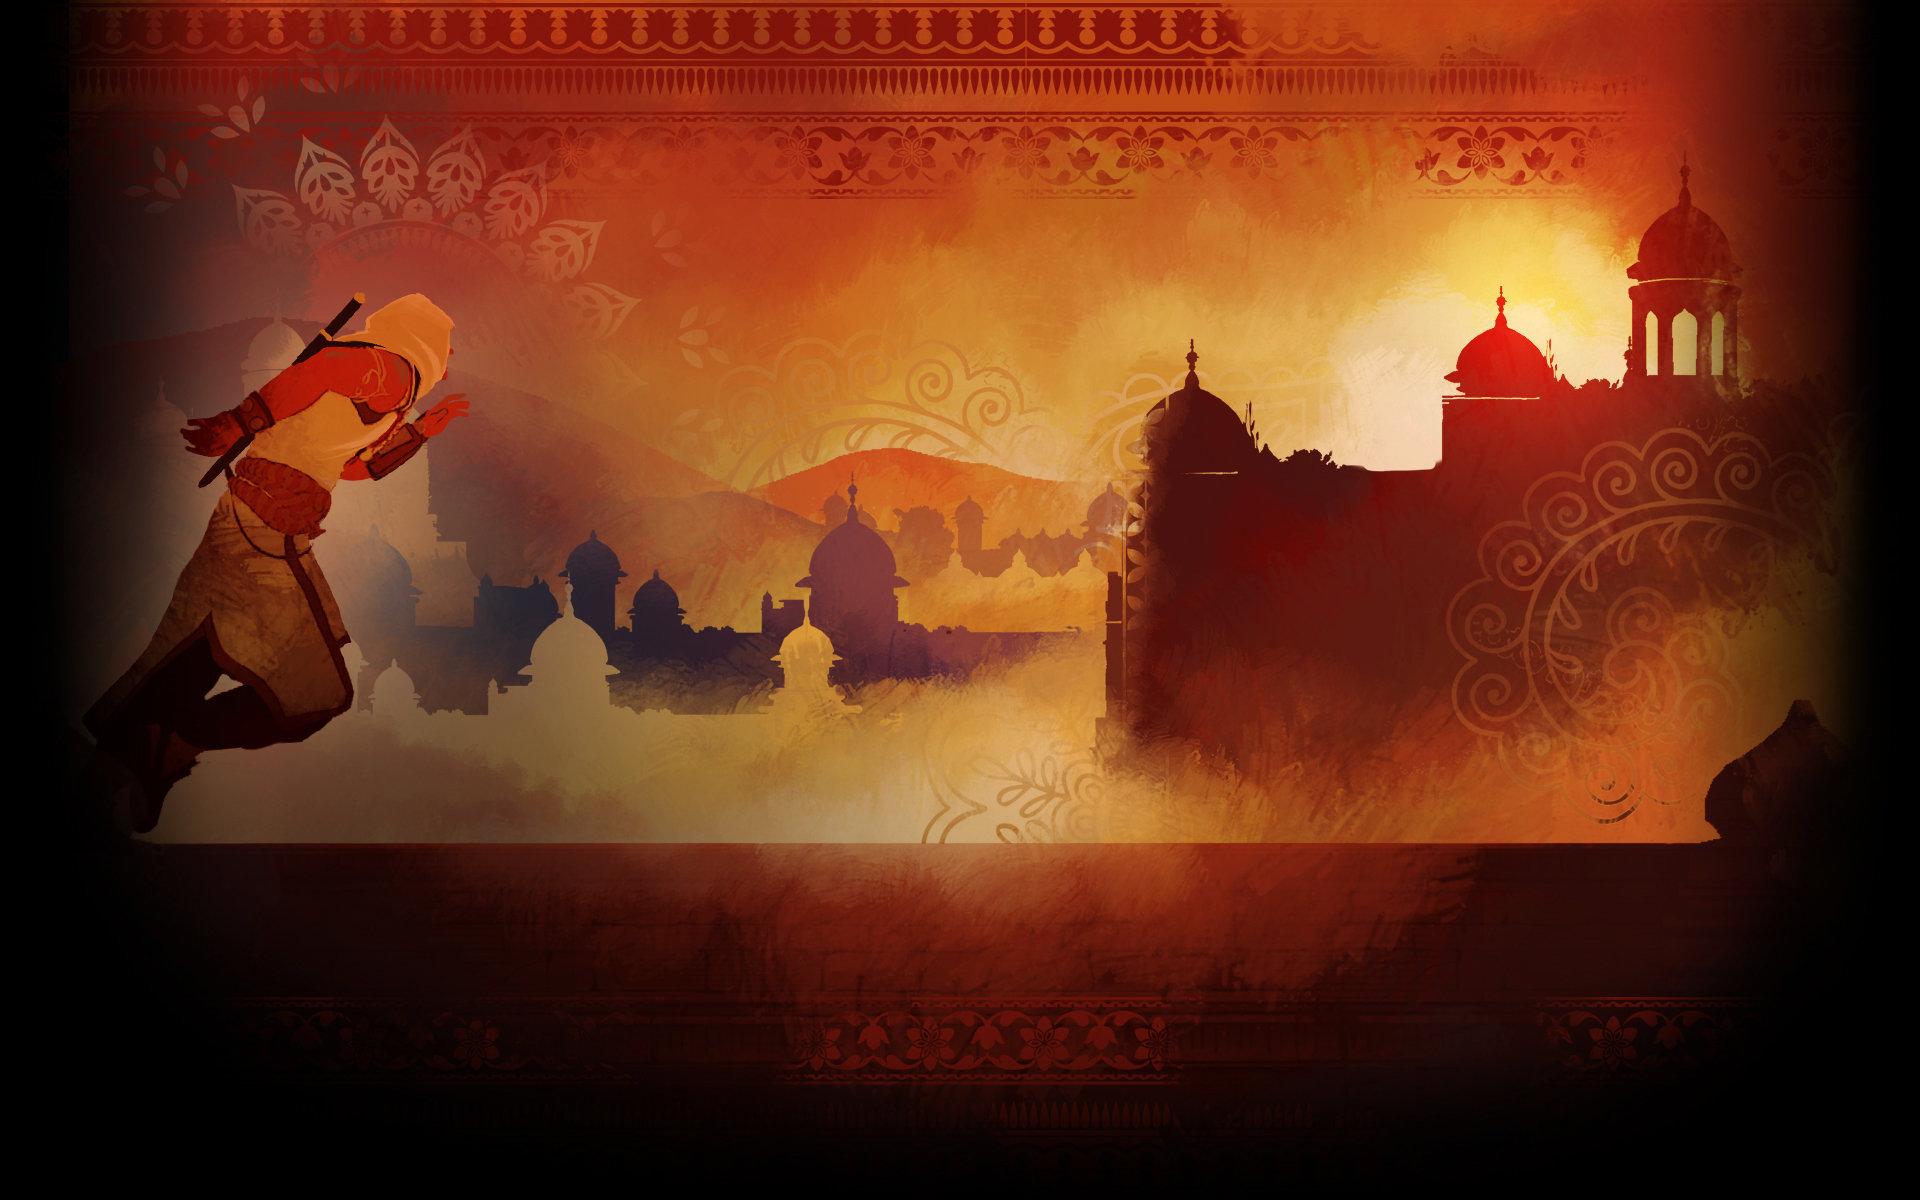 India Background: Assassin's Creed Chronicles India Background City